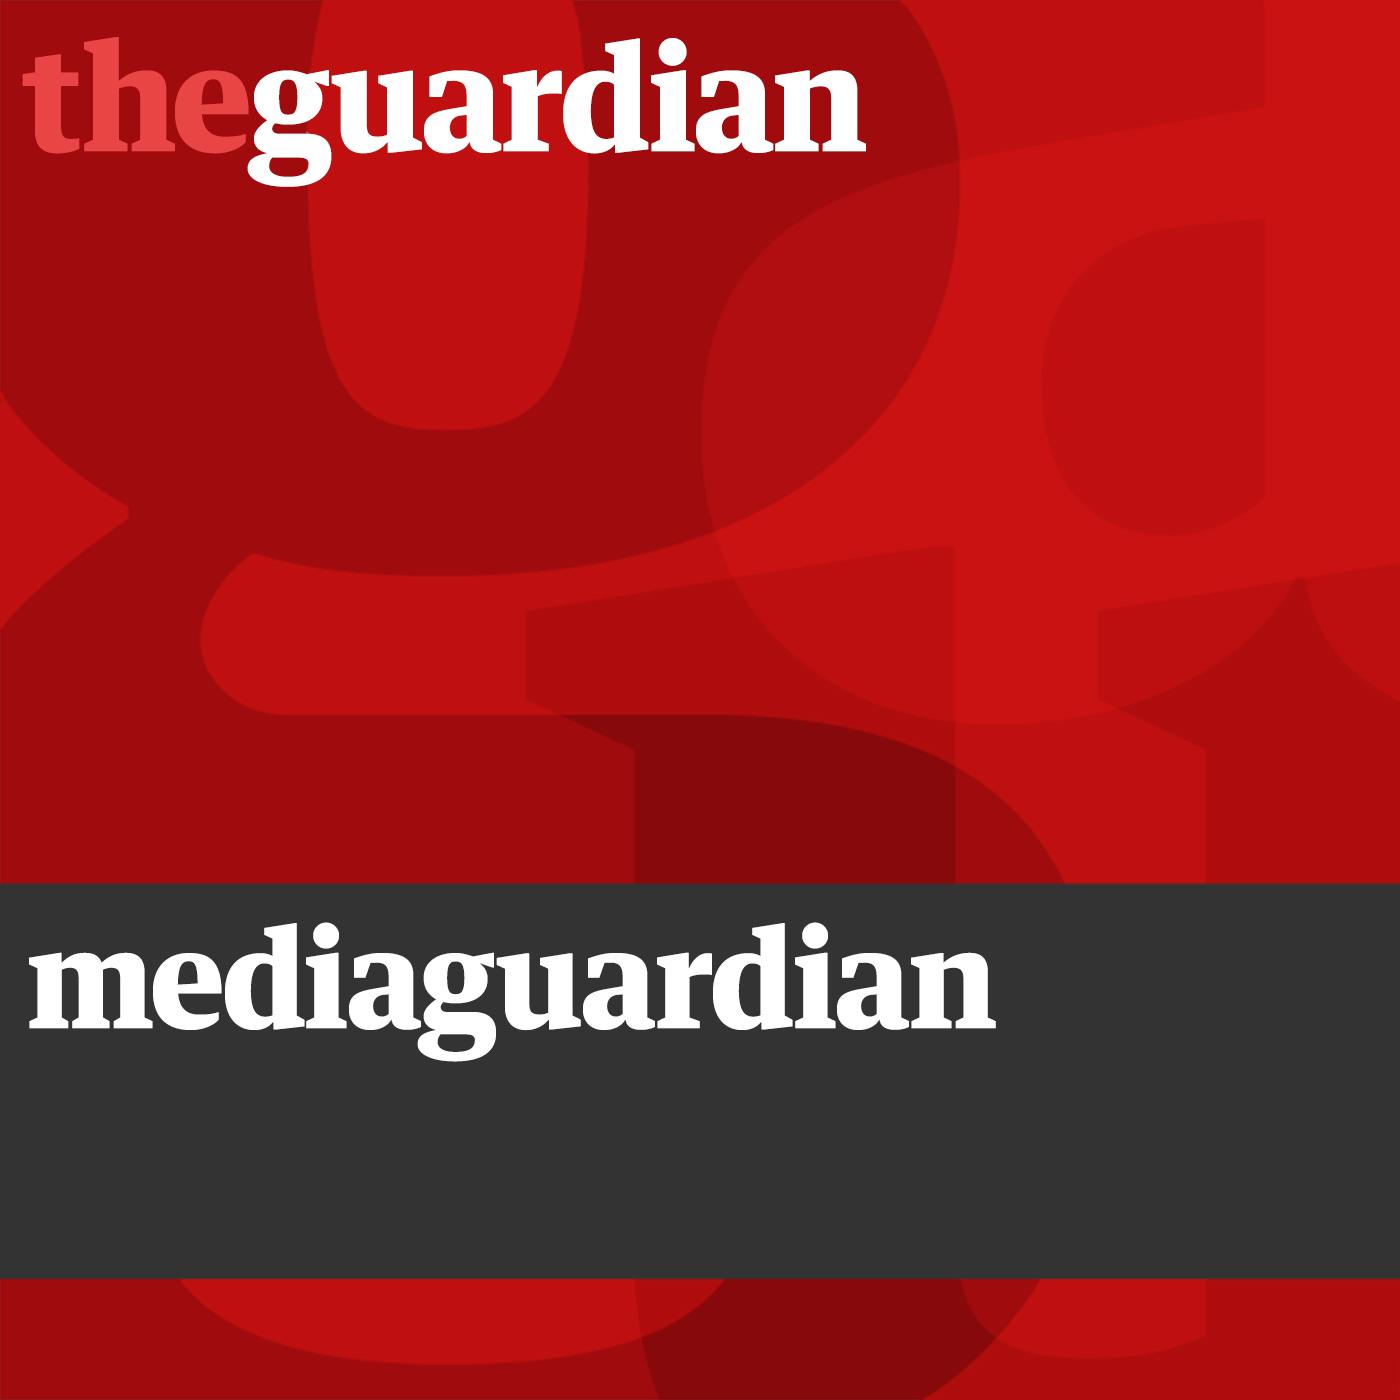 mediaguardian_podcast_1400x1400.jpg